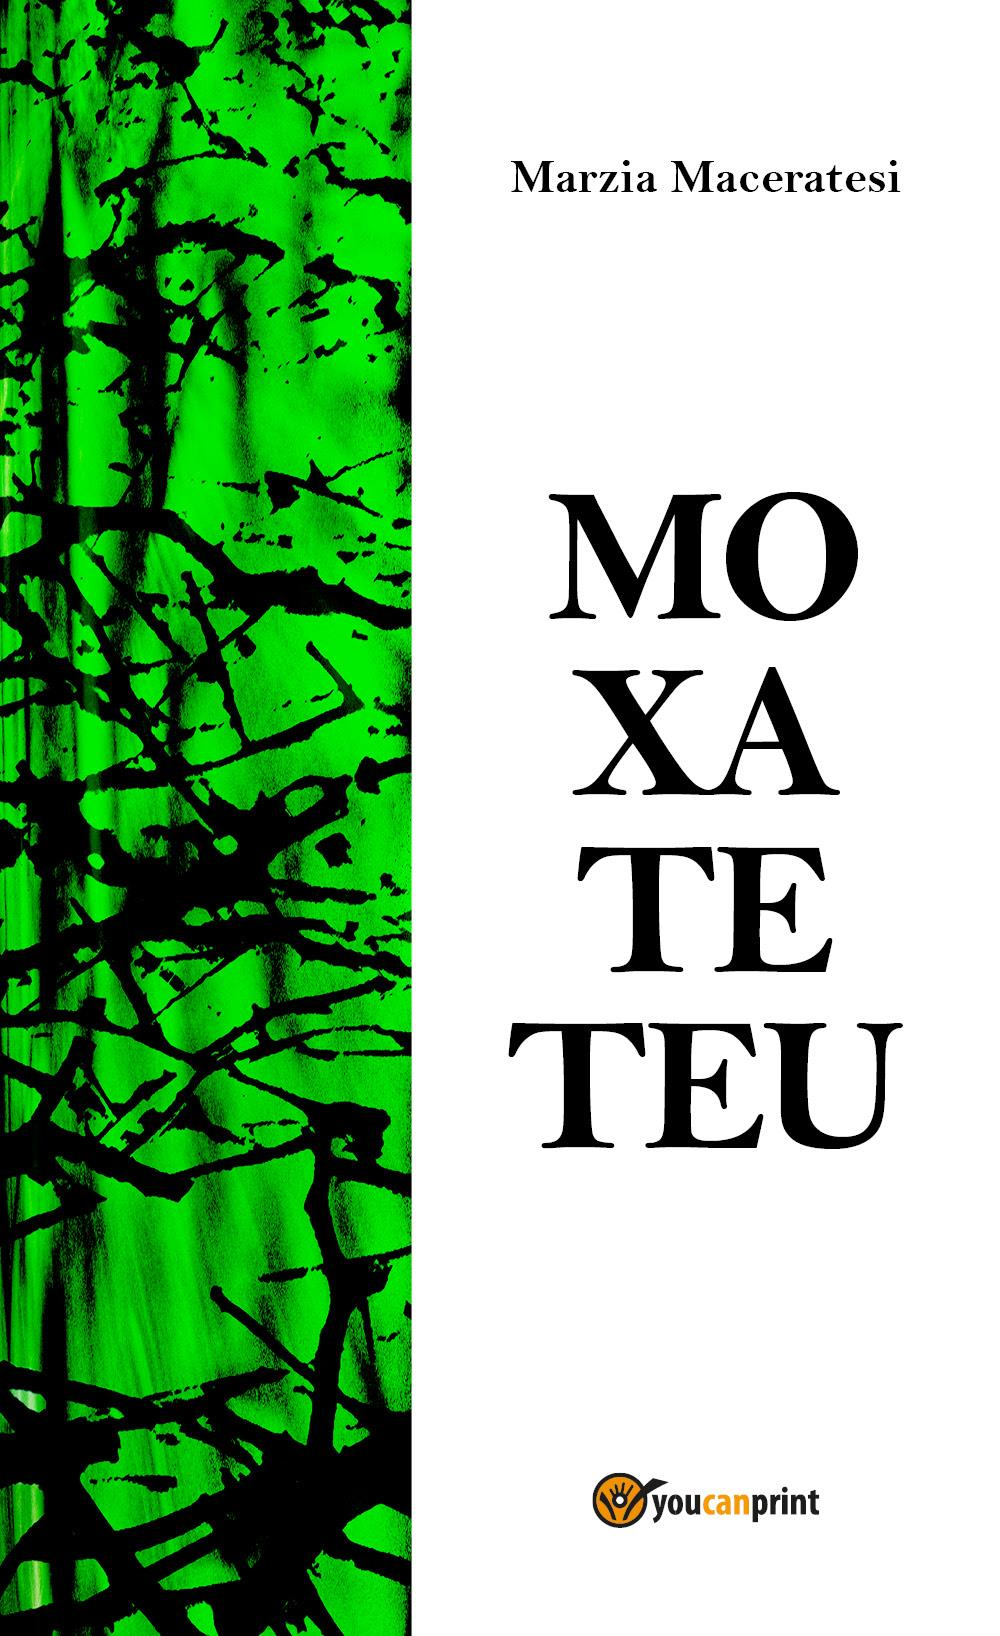 Moxateteu